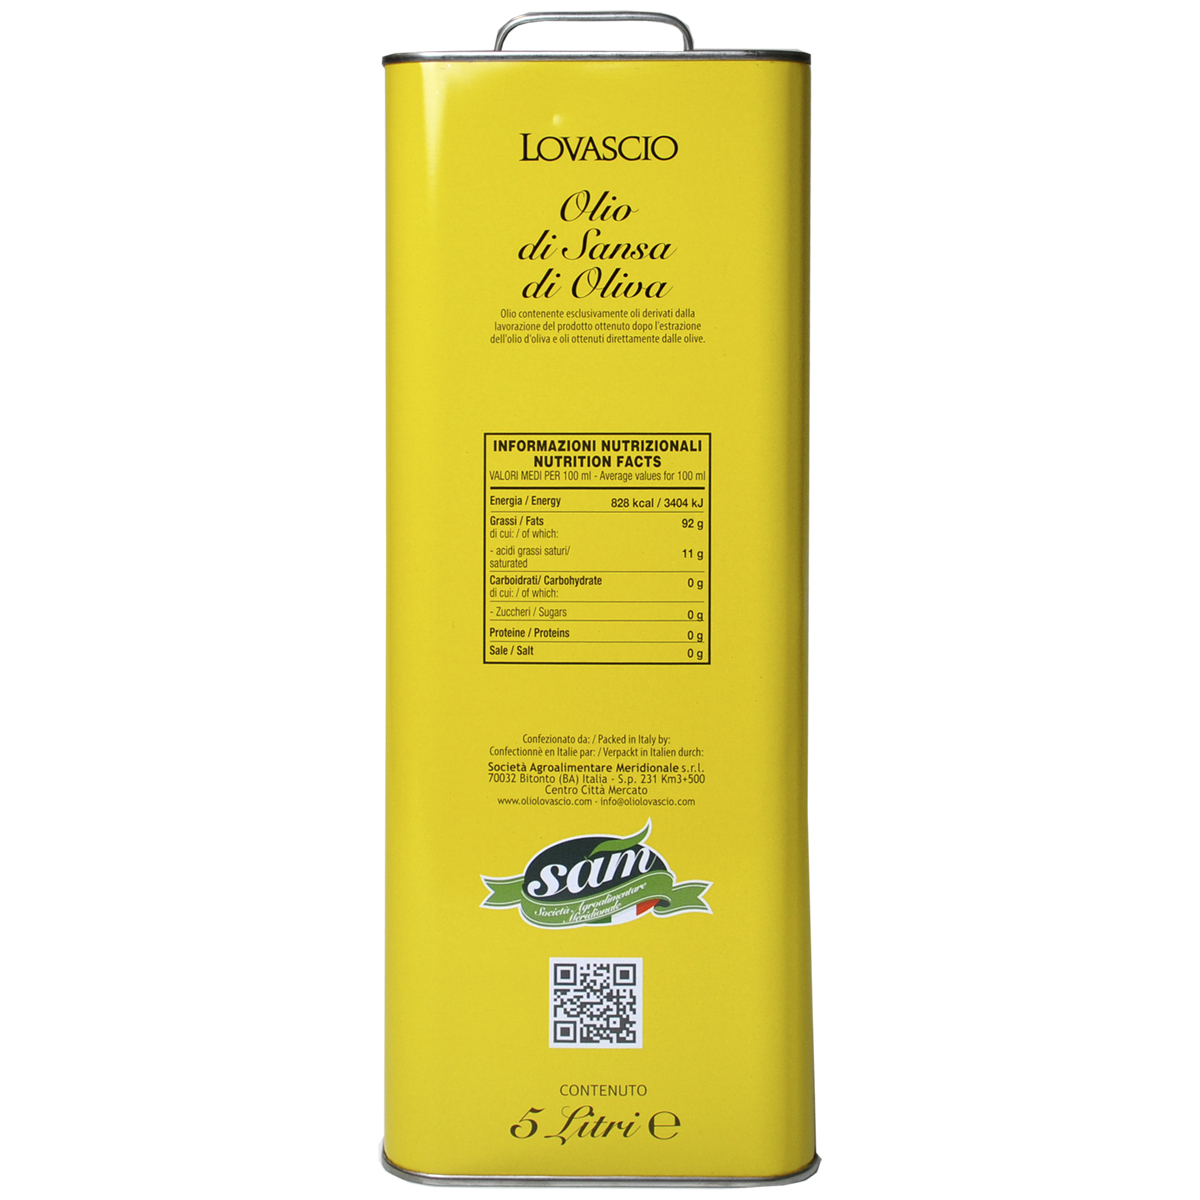 Оливковое масло Sansa 5л Lovascio